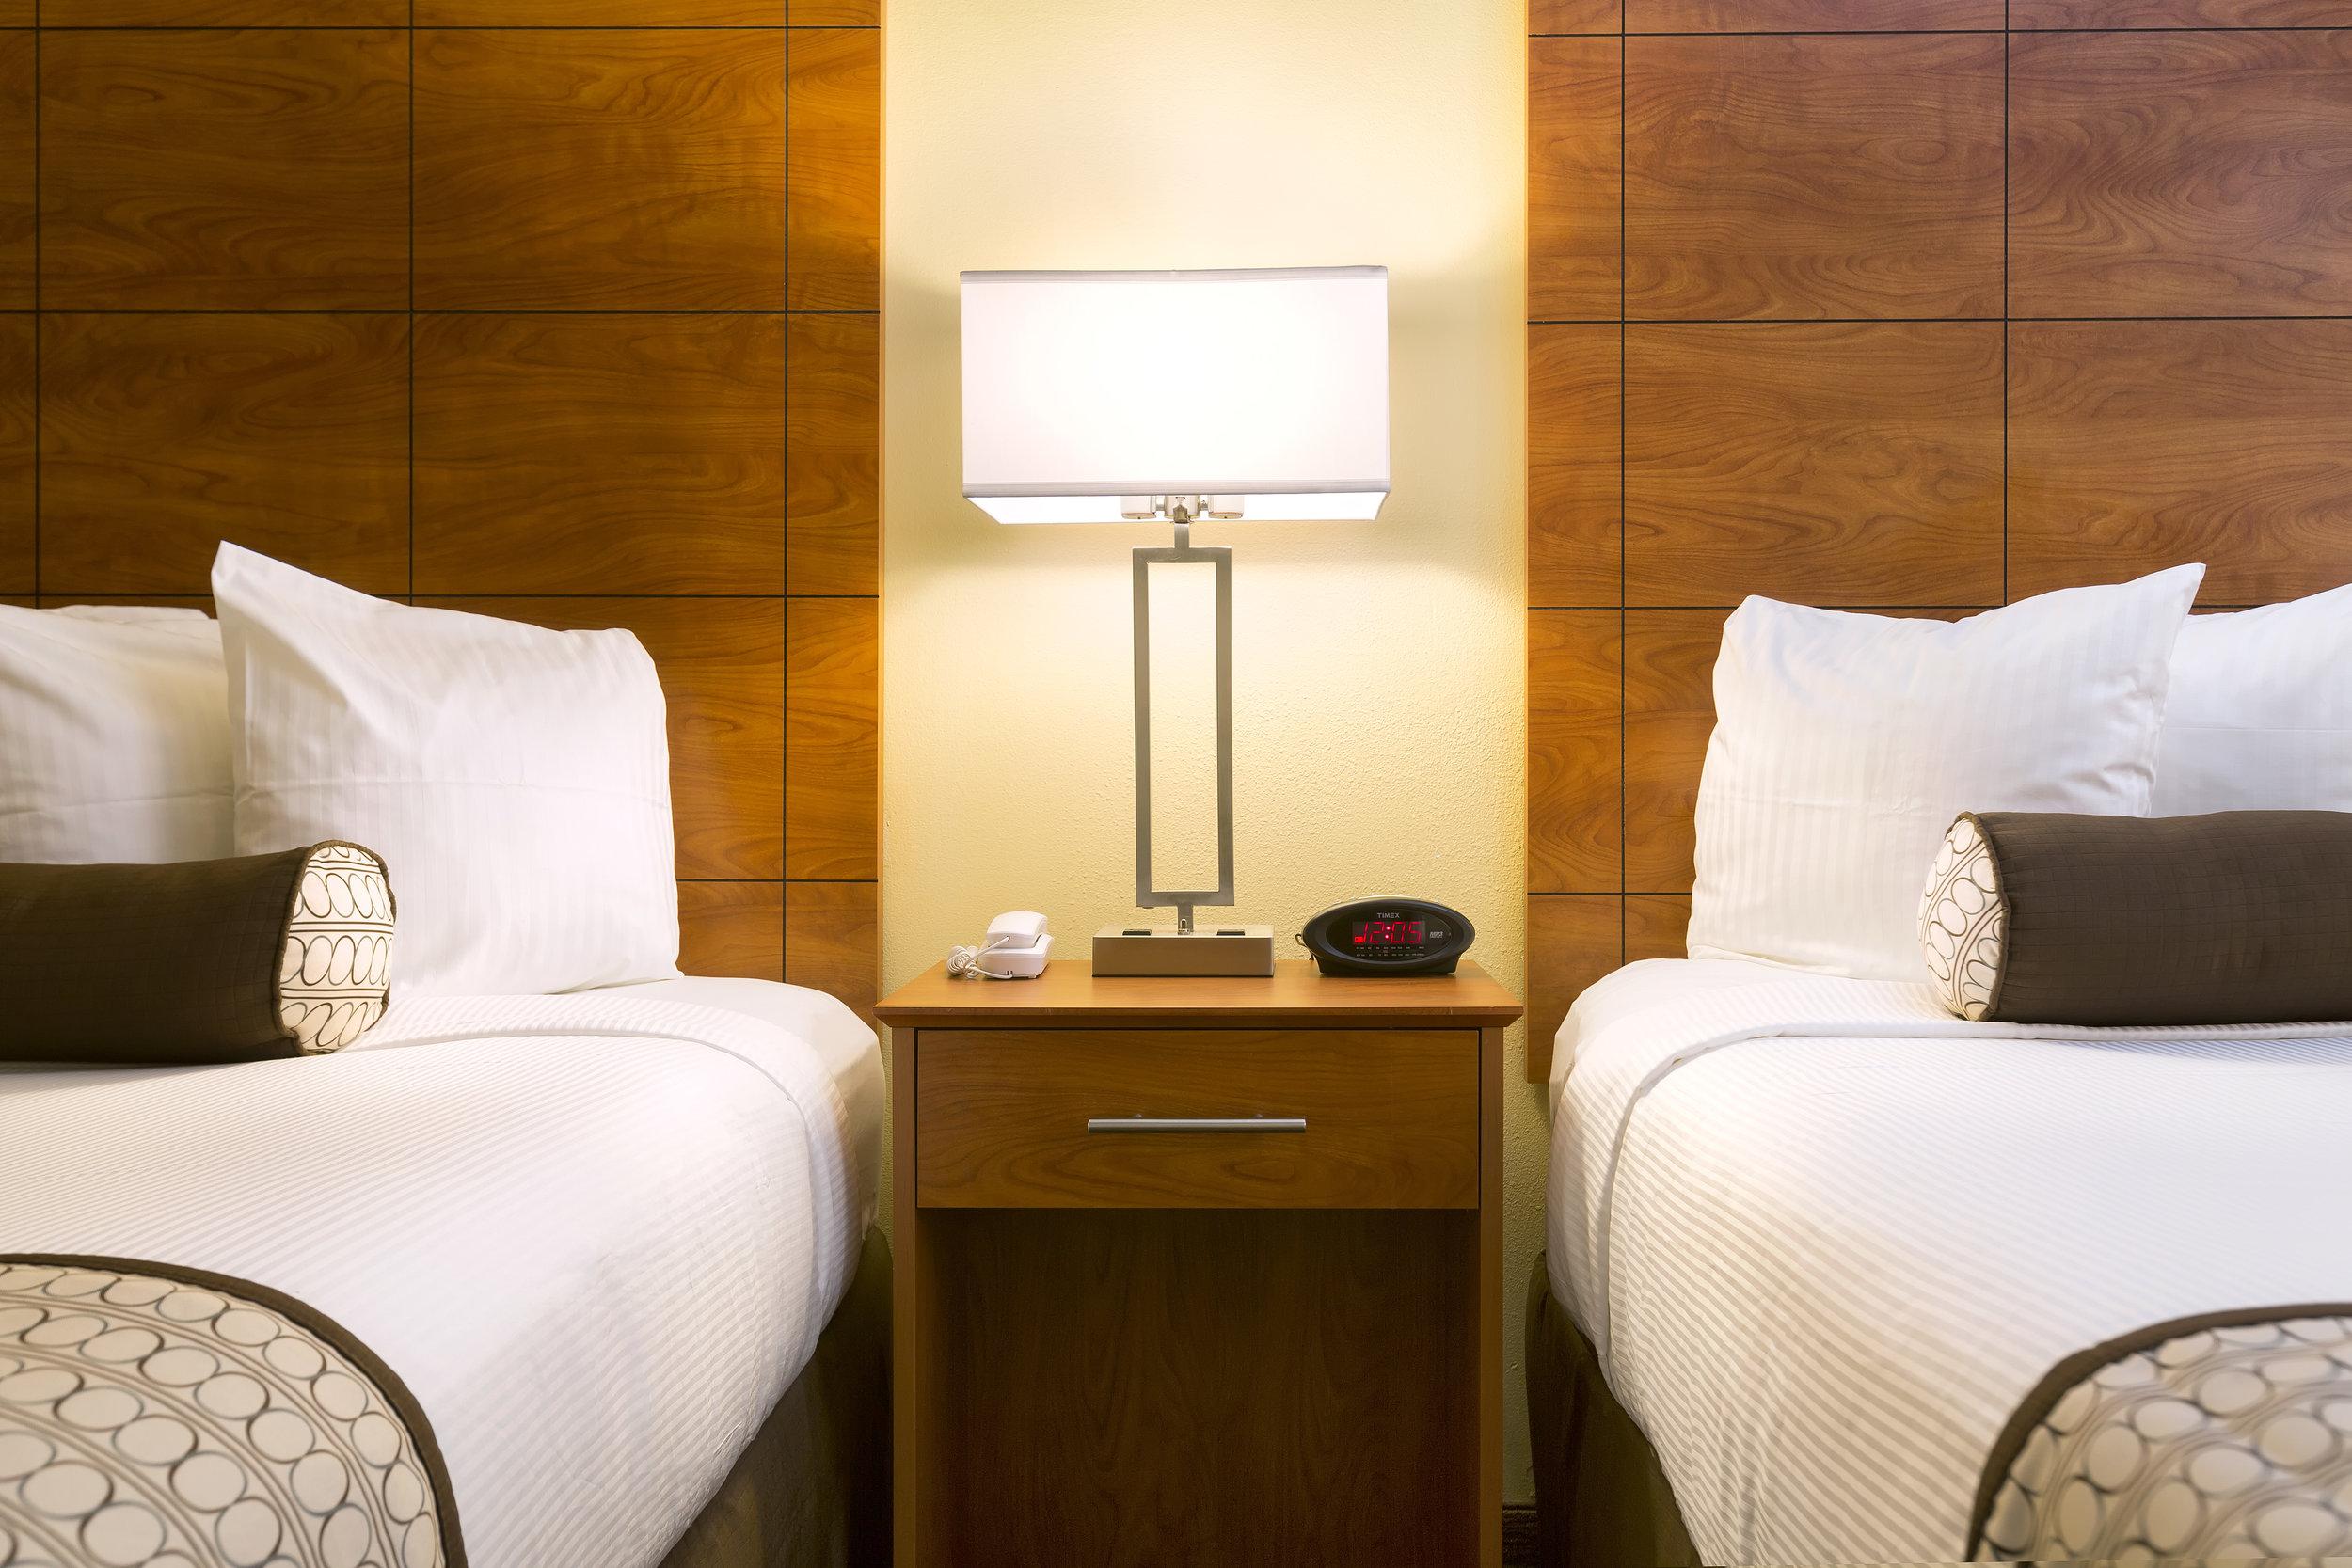 Best Western Orlando Gateway Hotel Beds Close Up